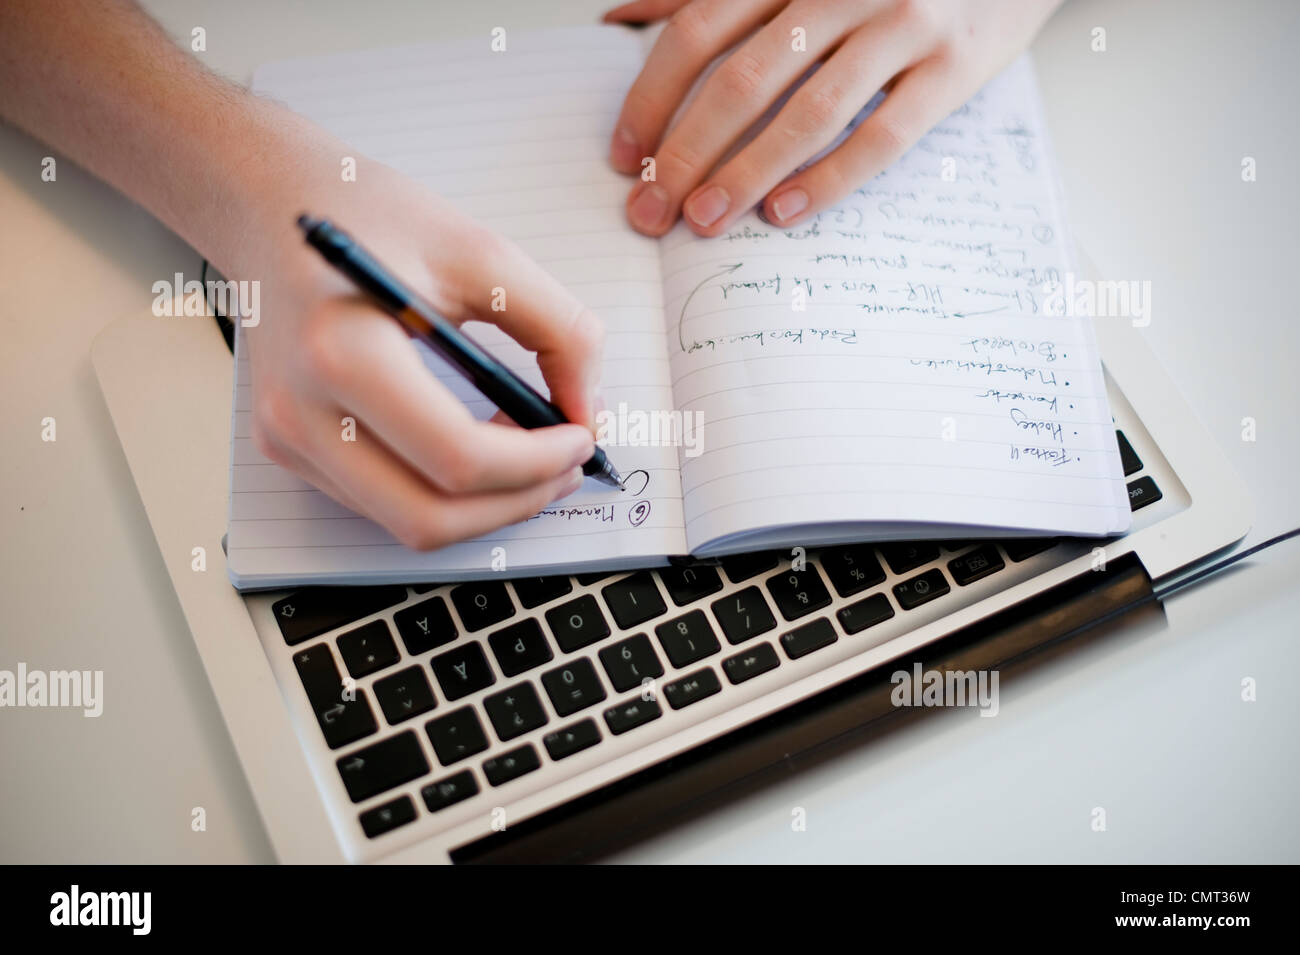 Close-up de mano humana escrito en el bloc de notas Imagen De Stock